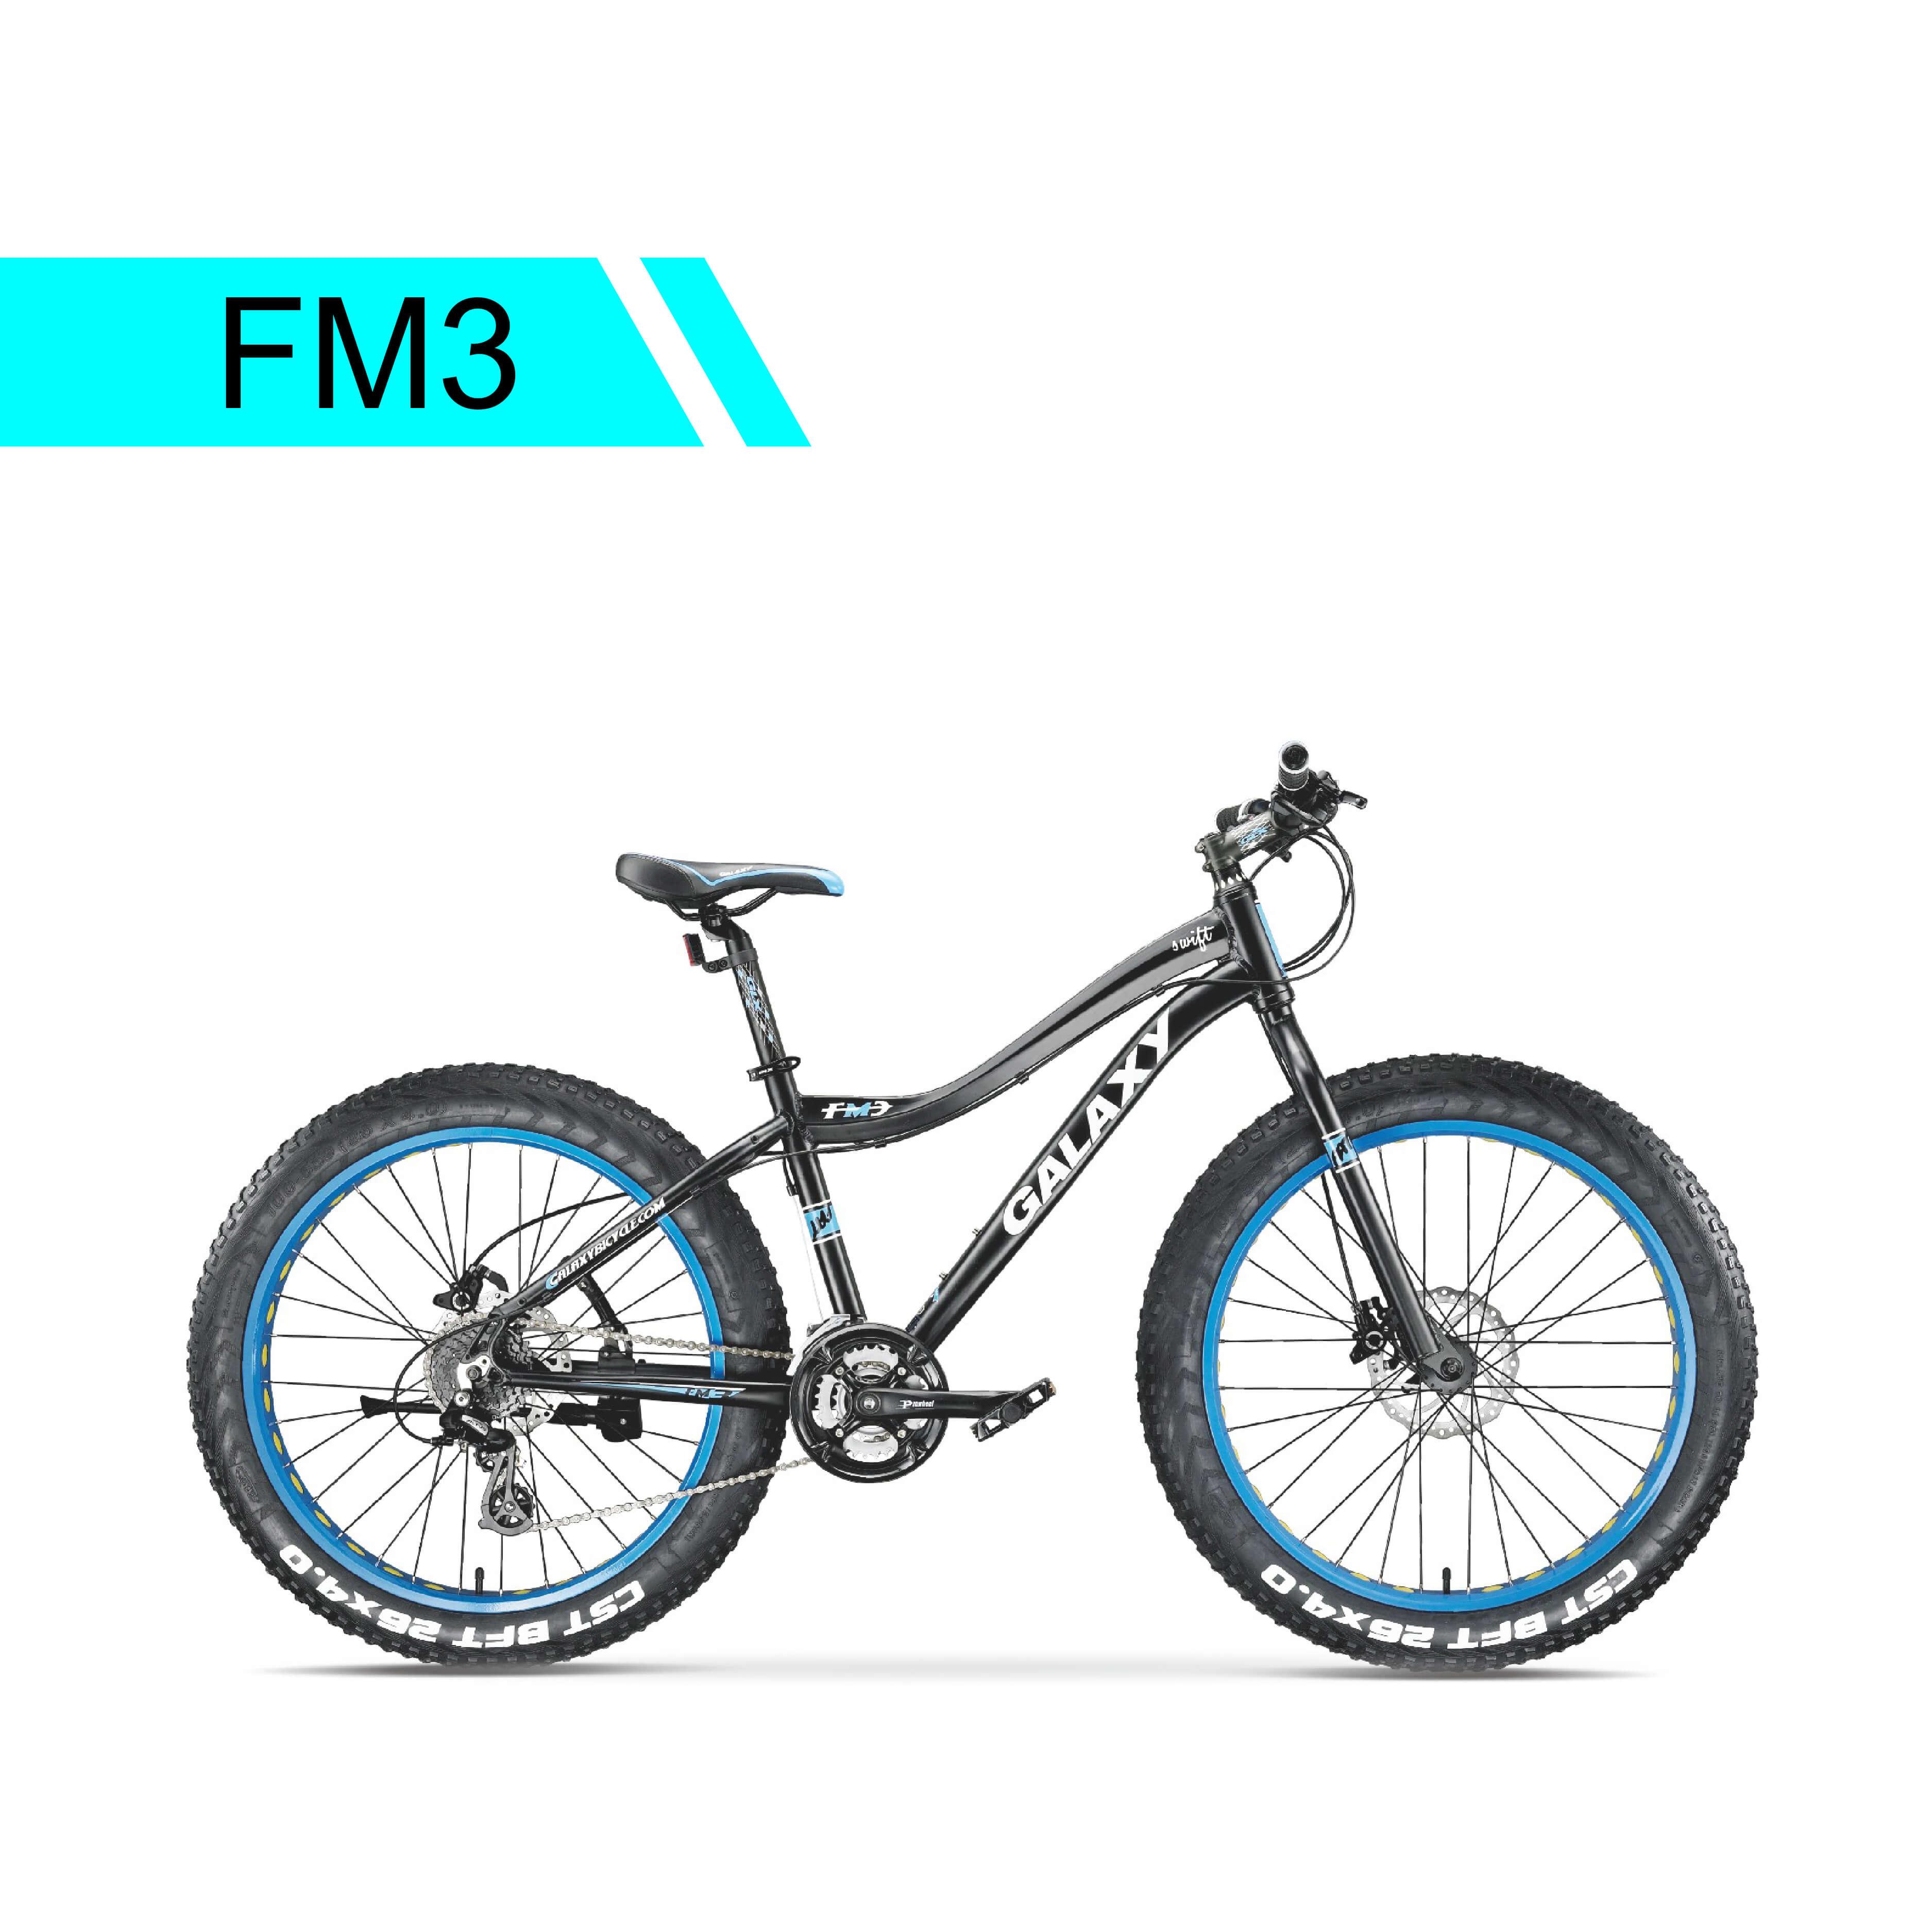 "High Quality 26"" Alloy Frame Folding Bike"